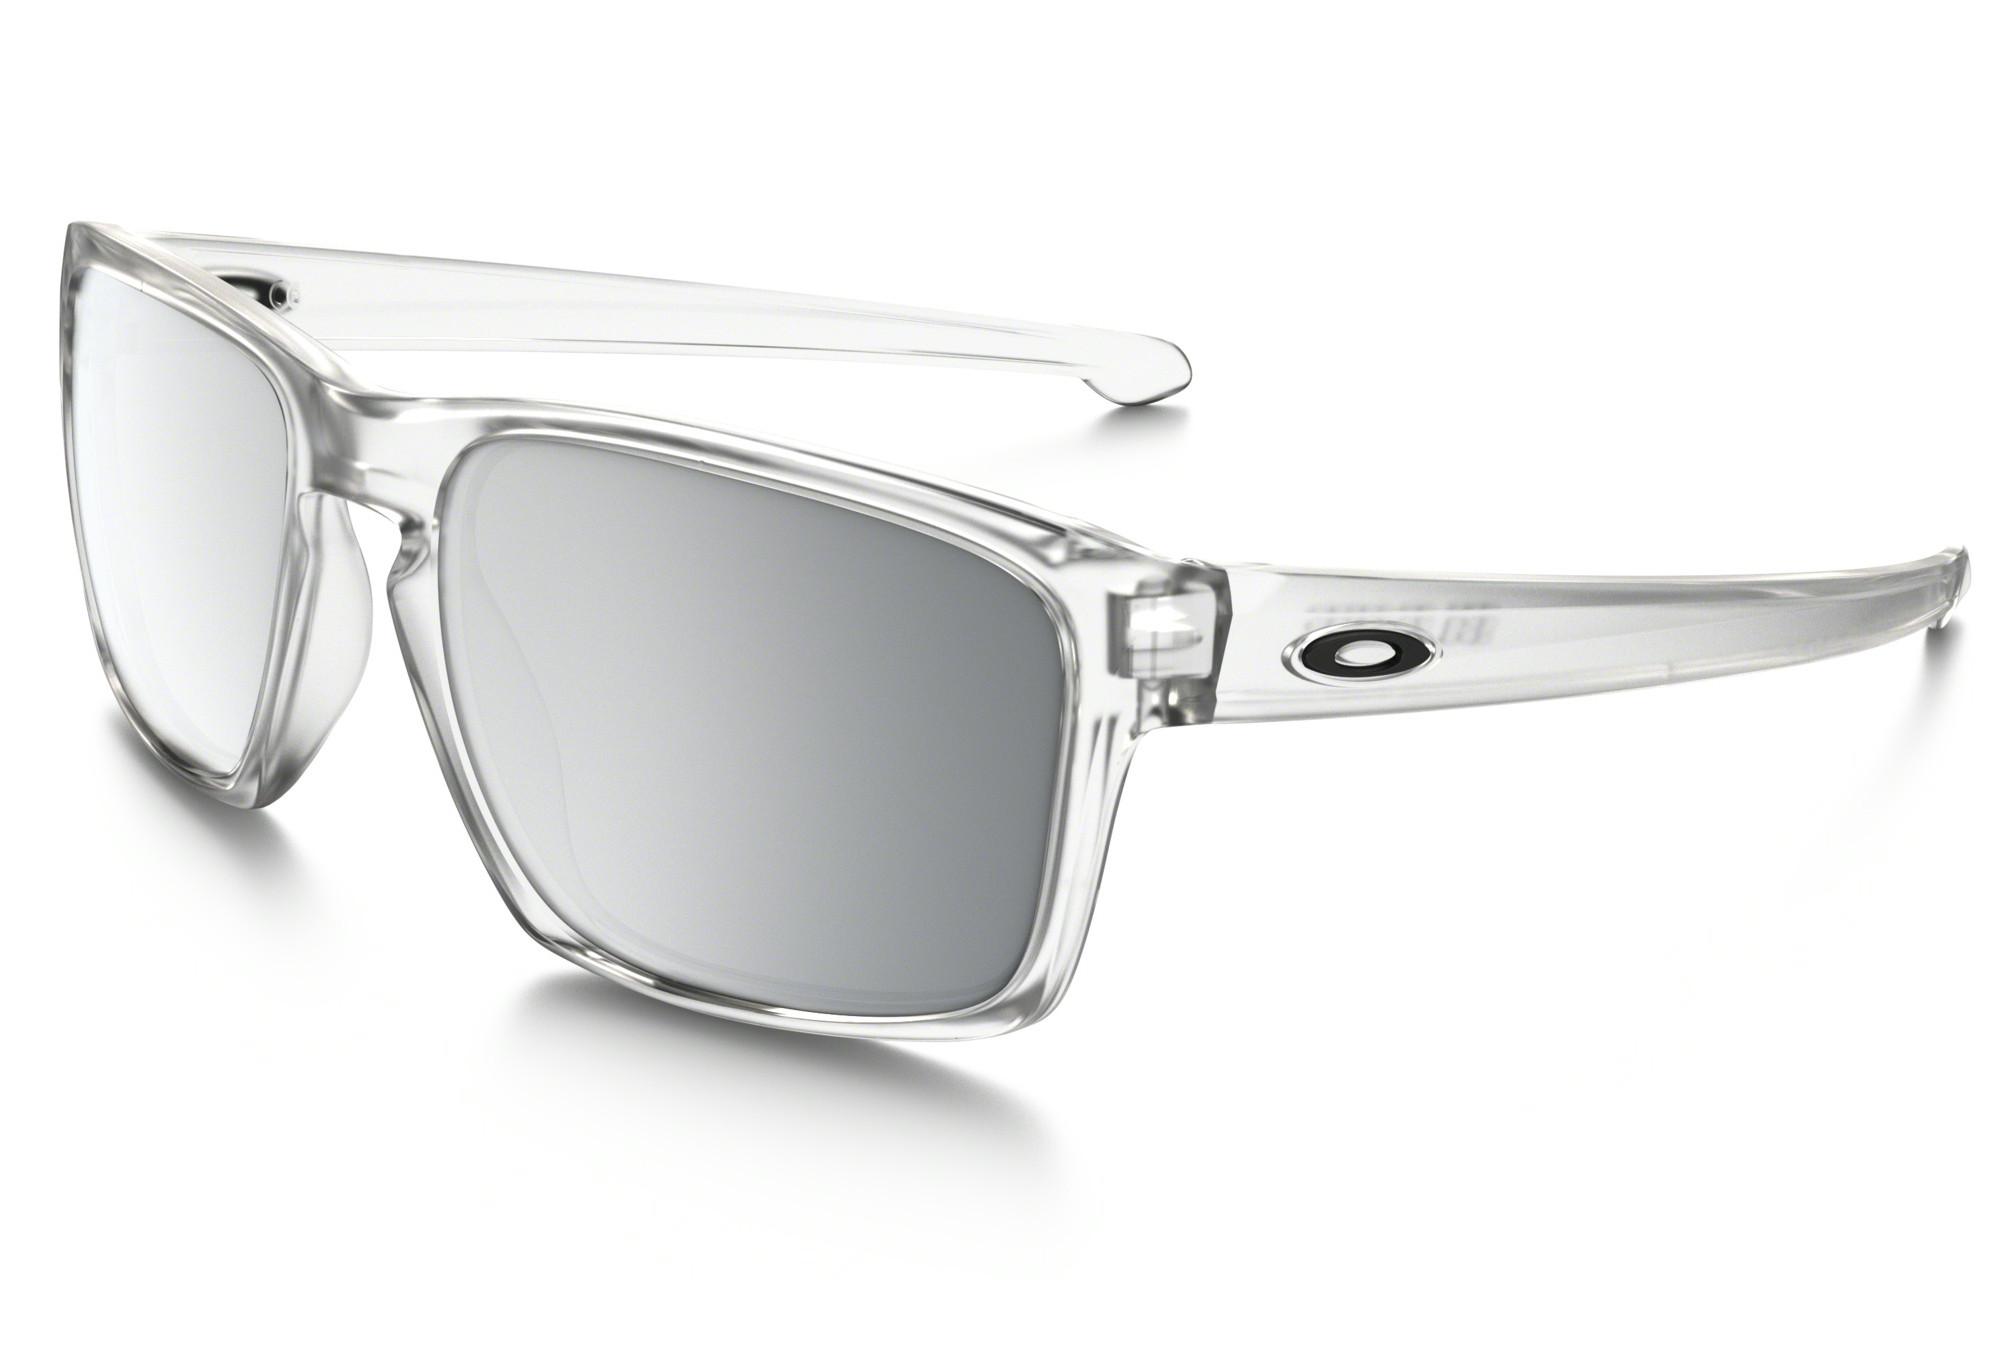 Lunettes OAKLEY SLIVER Transparent - Chrome Iridium Réf OO9262-23 ... eca13f5c4a33